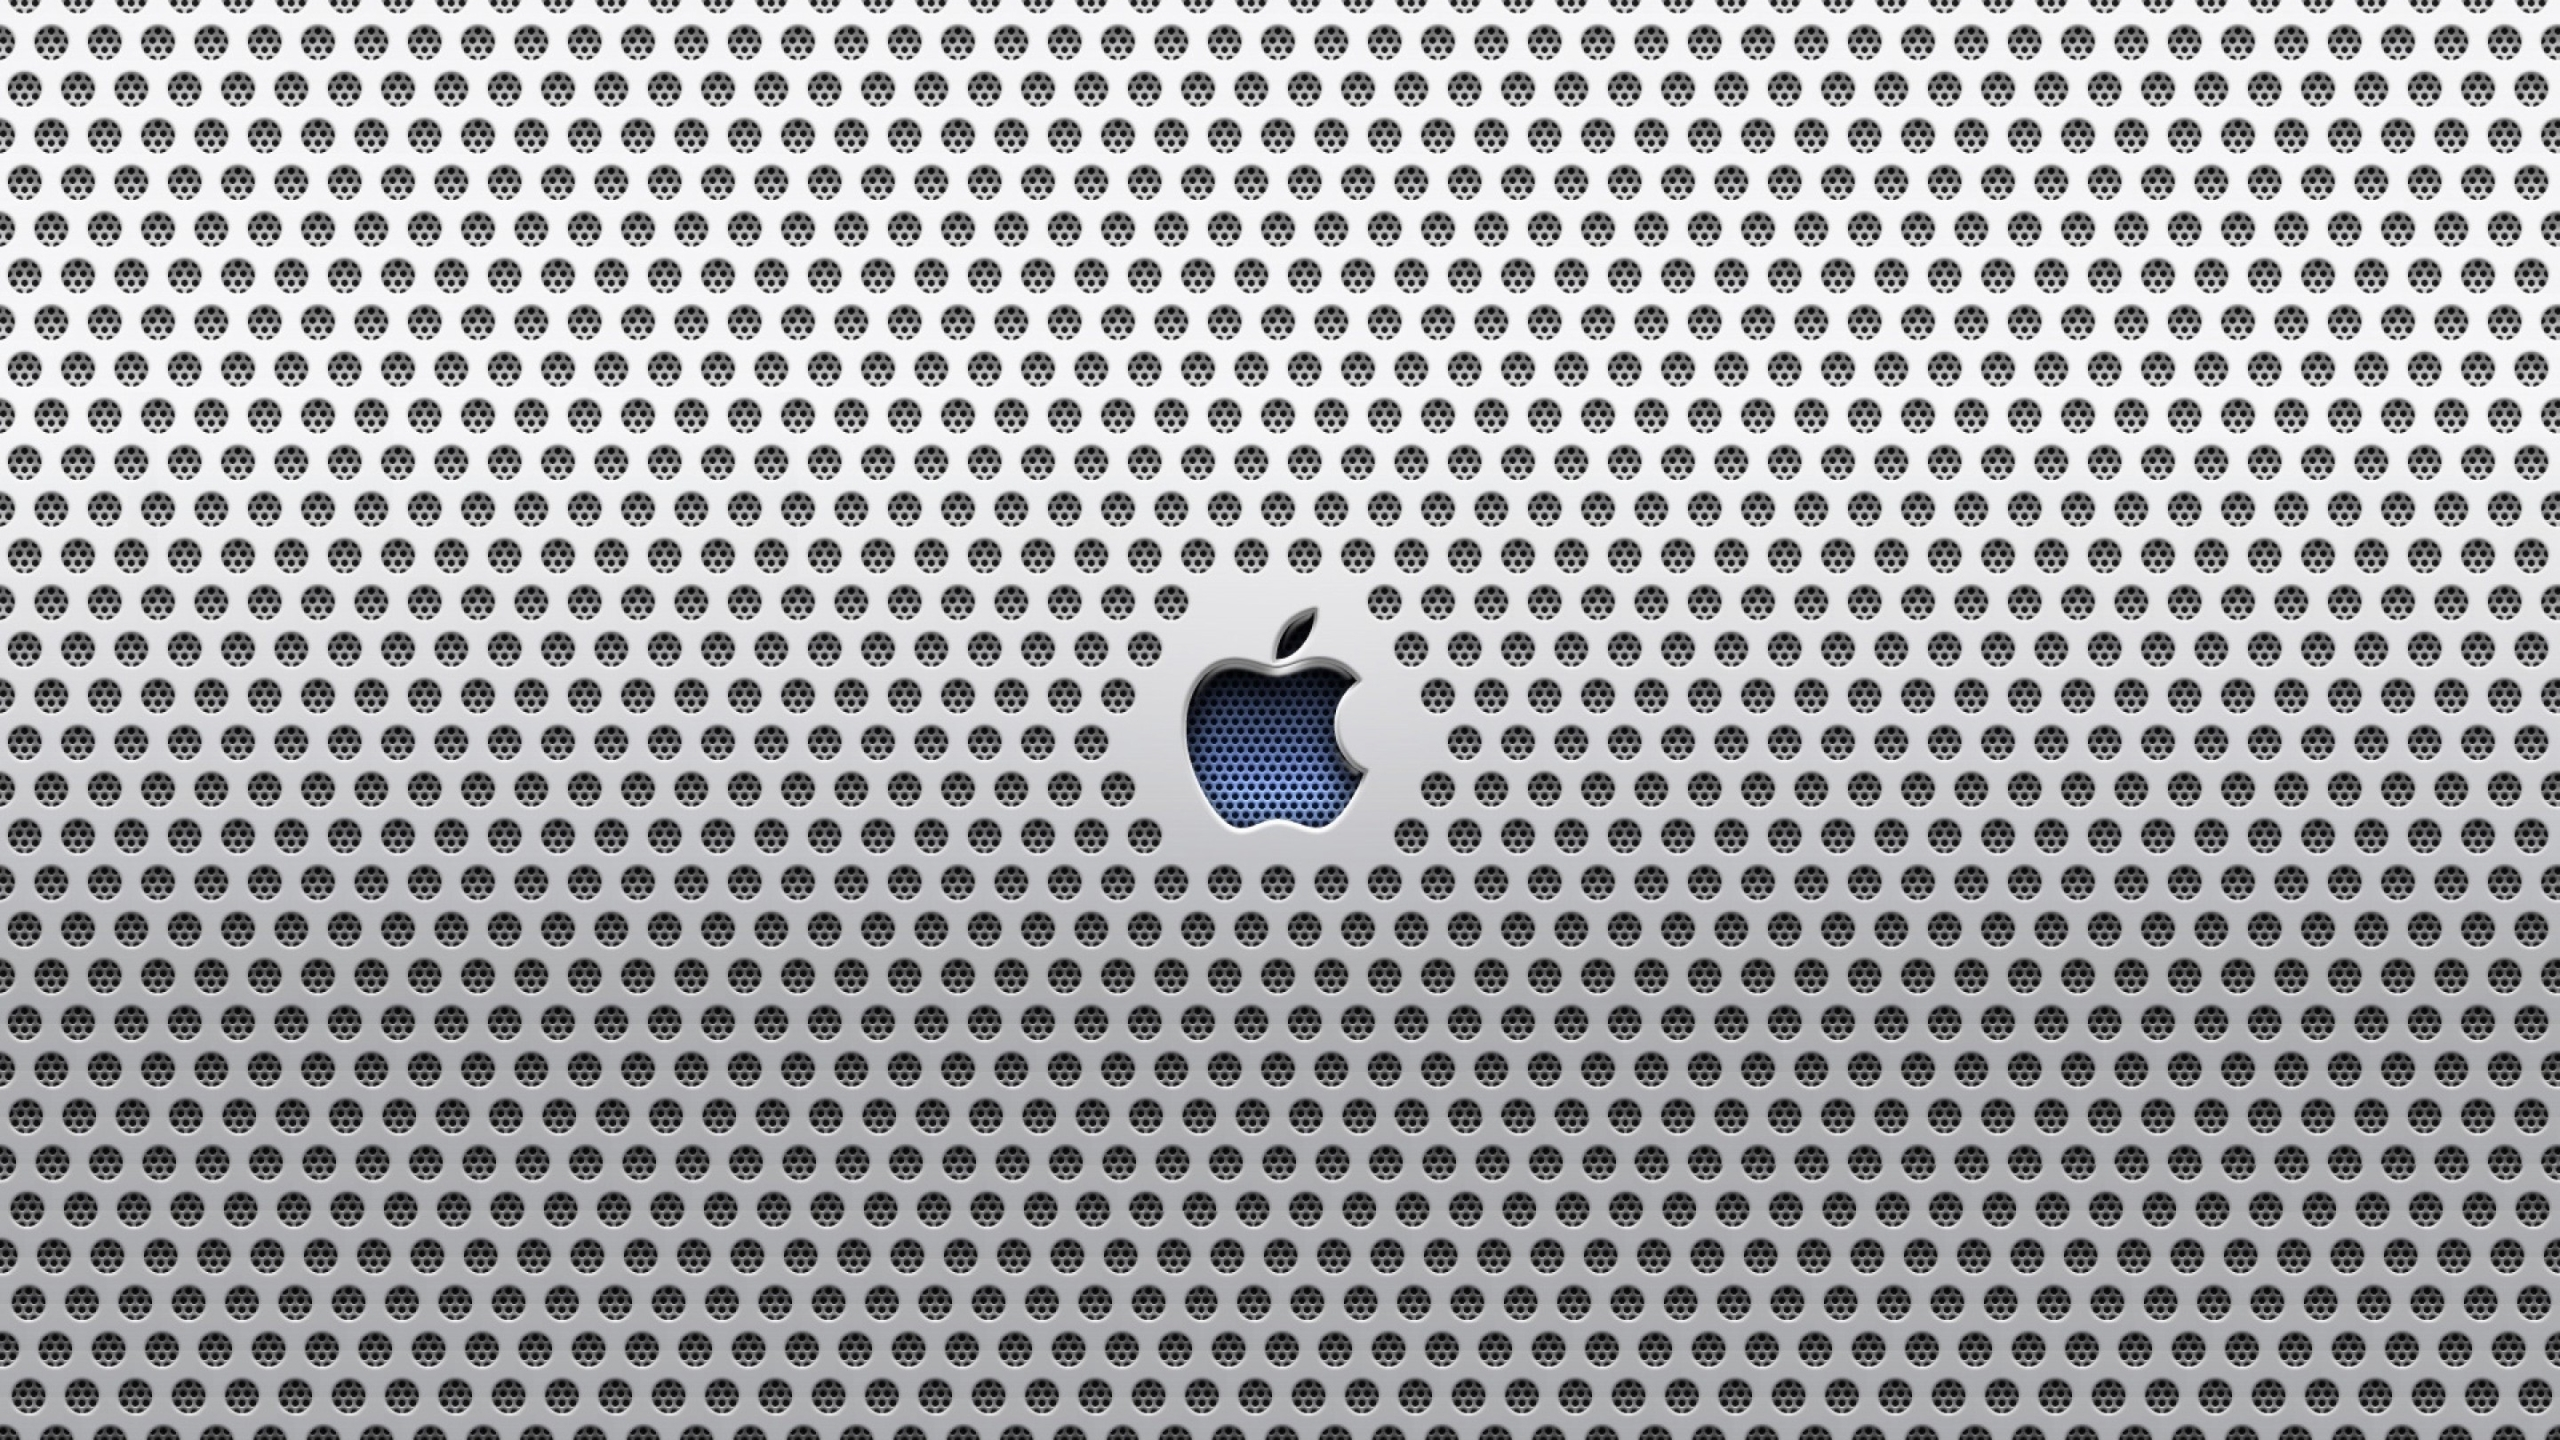 iMac 215 inch 1920x1080 iMac 27 inch 2560x1440 2560x1440